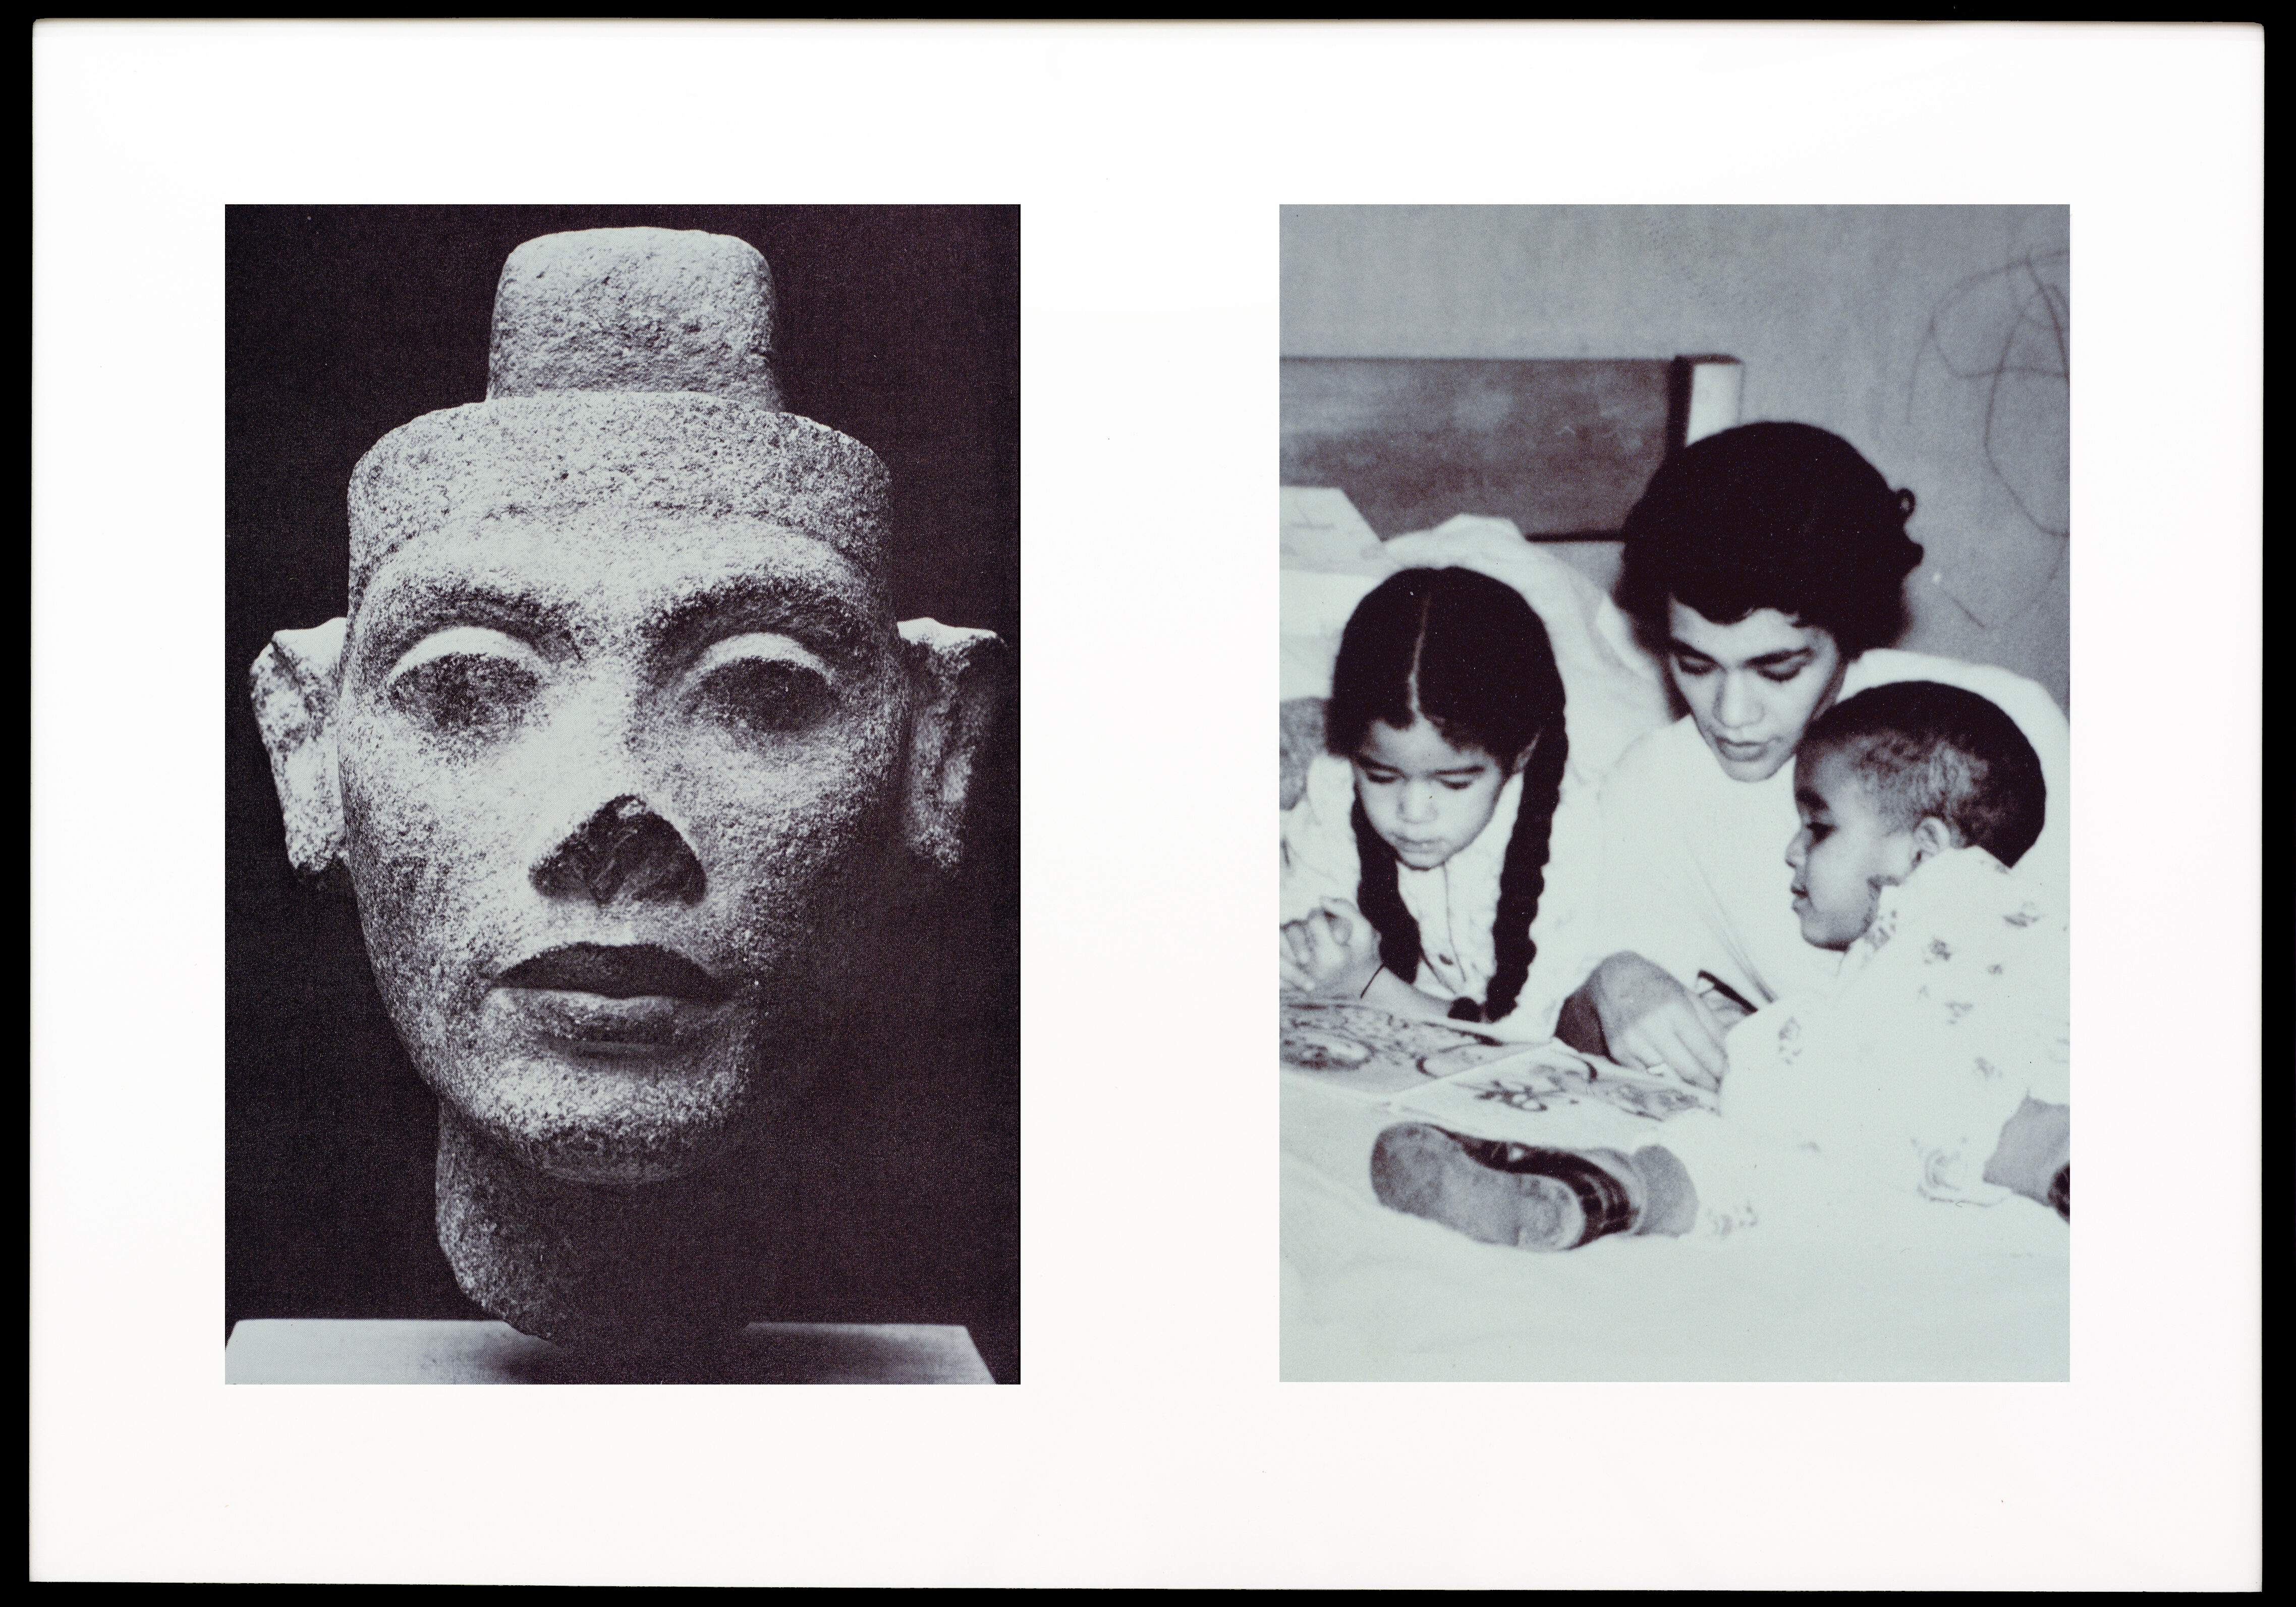 OGrady_Motherhood_framed_1980_1994